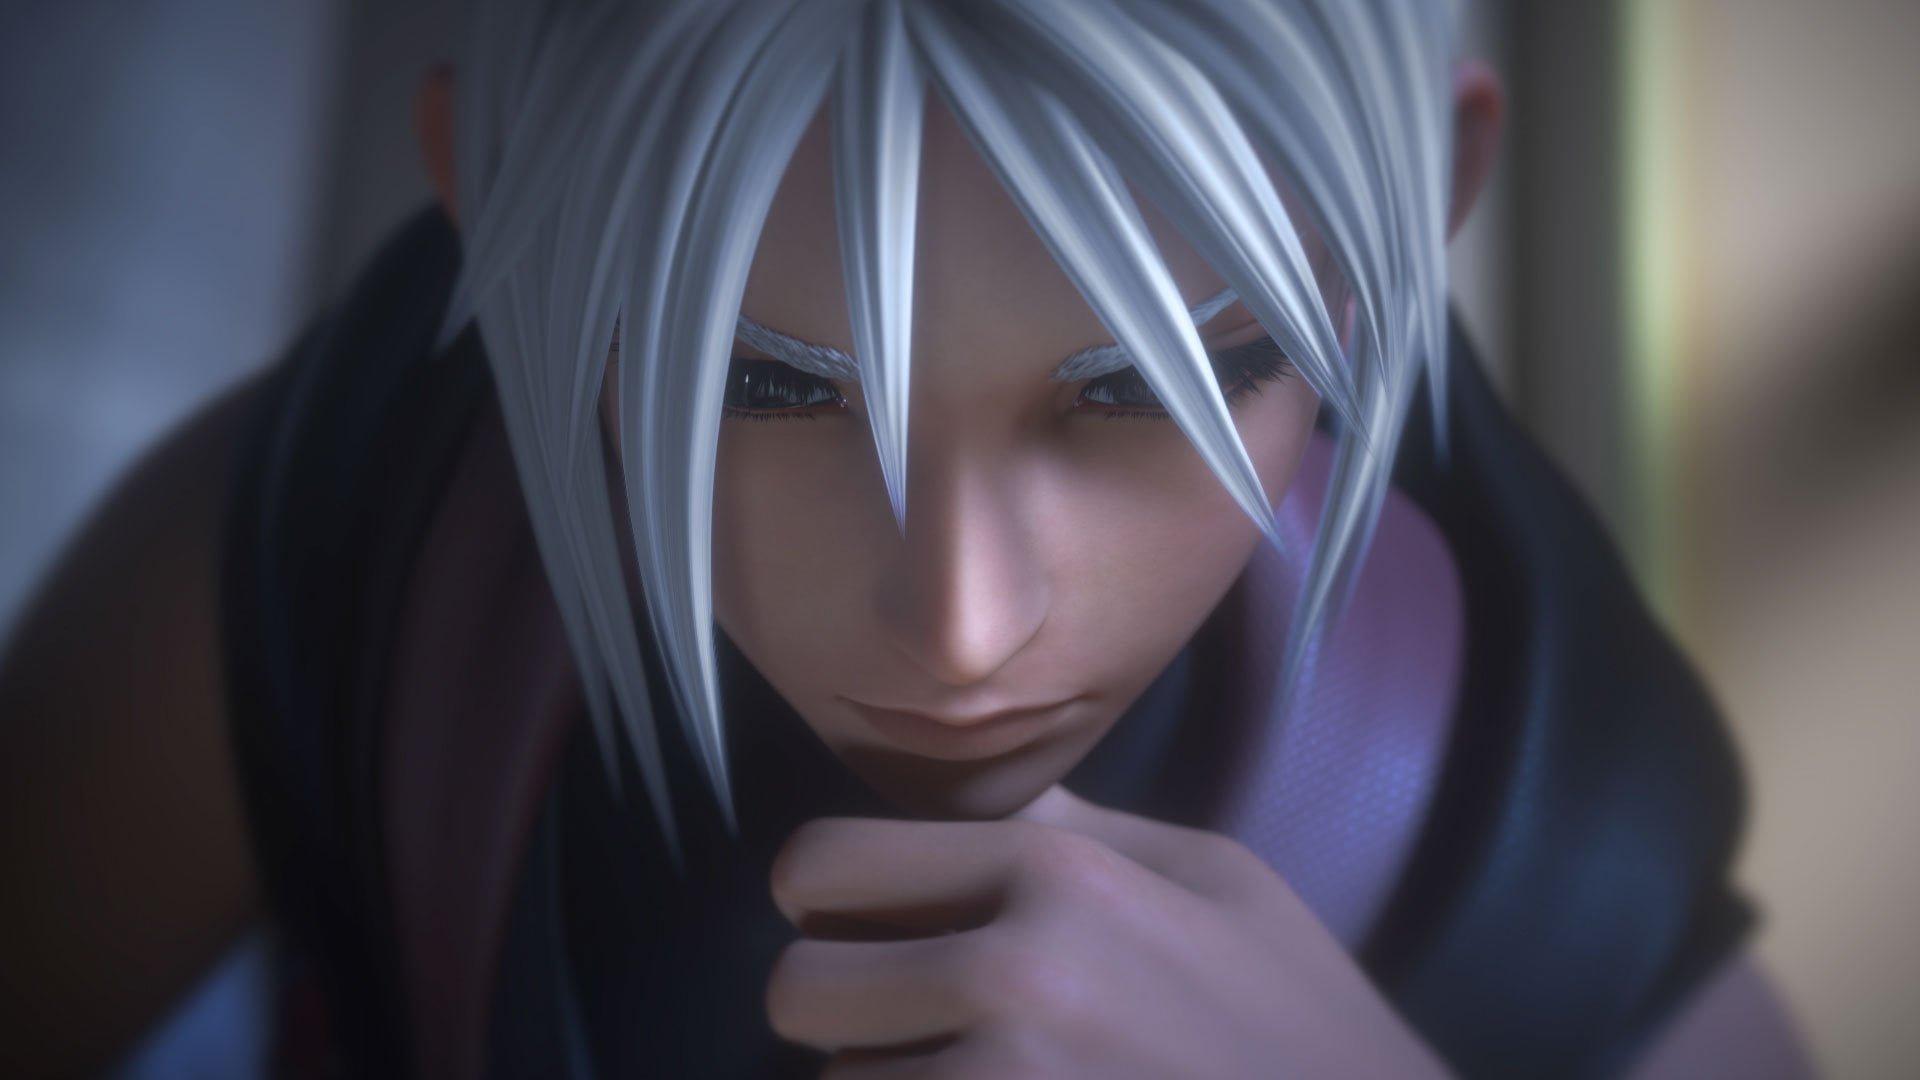 Kingdom Hearts: Dark Road is delayed by Square Enix